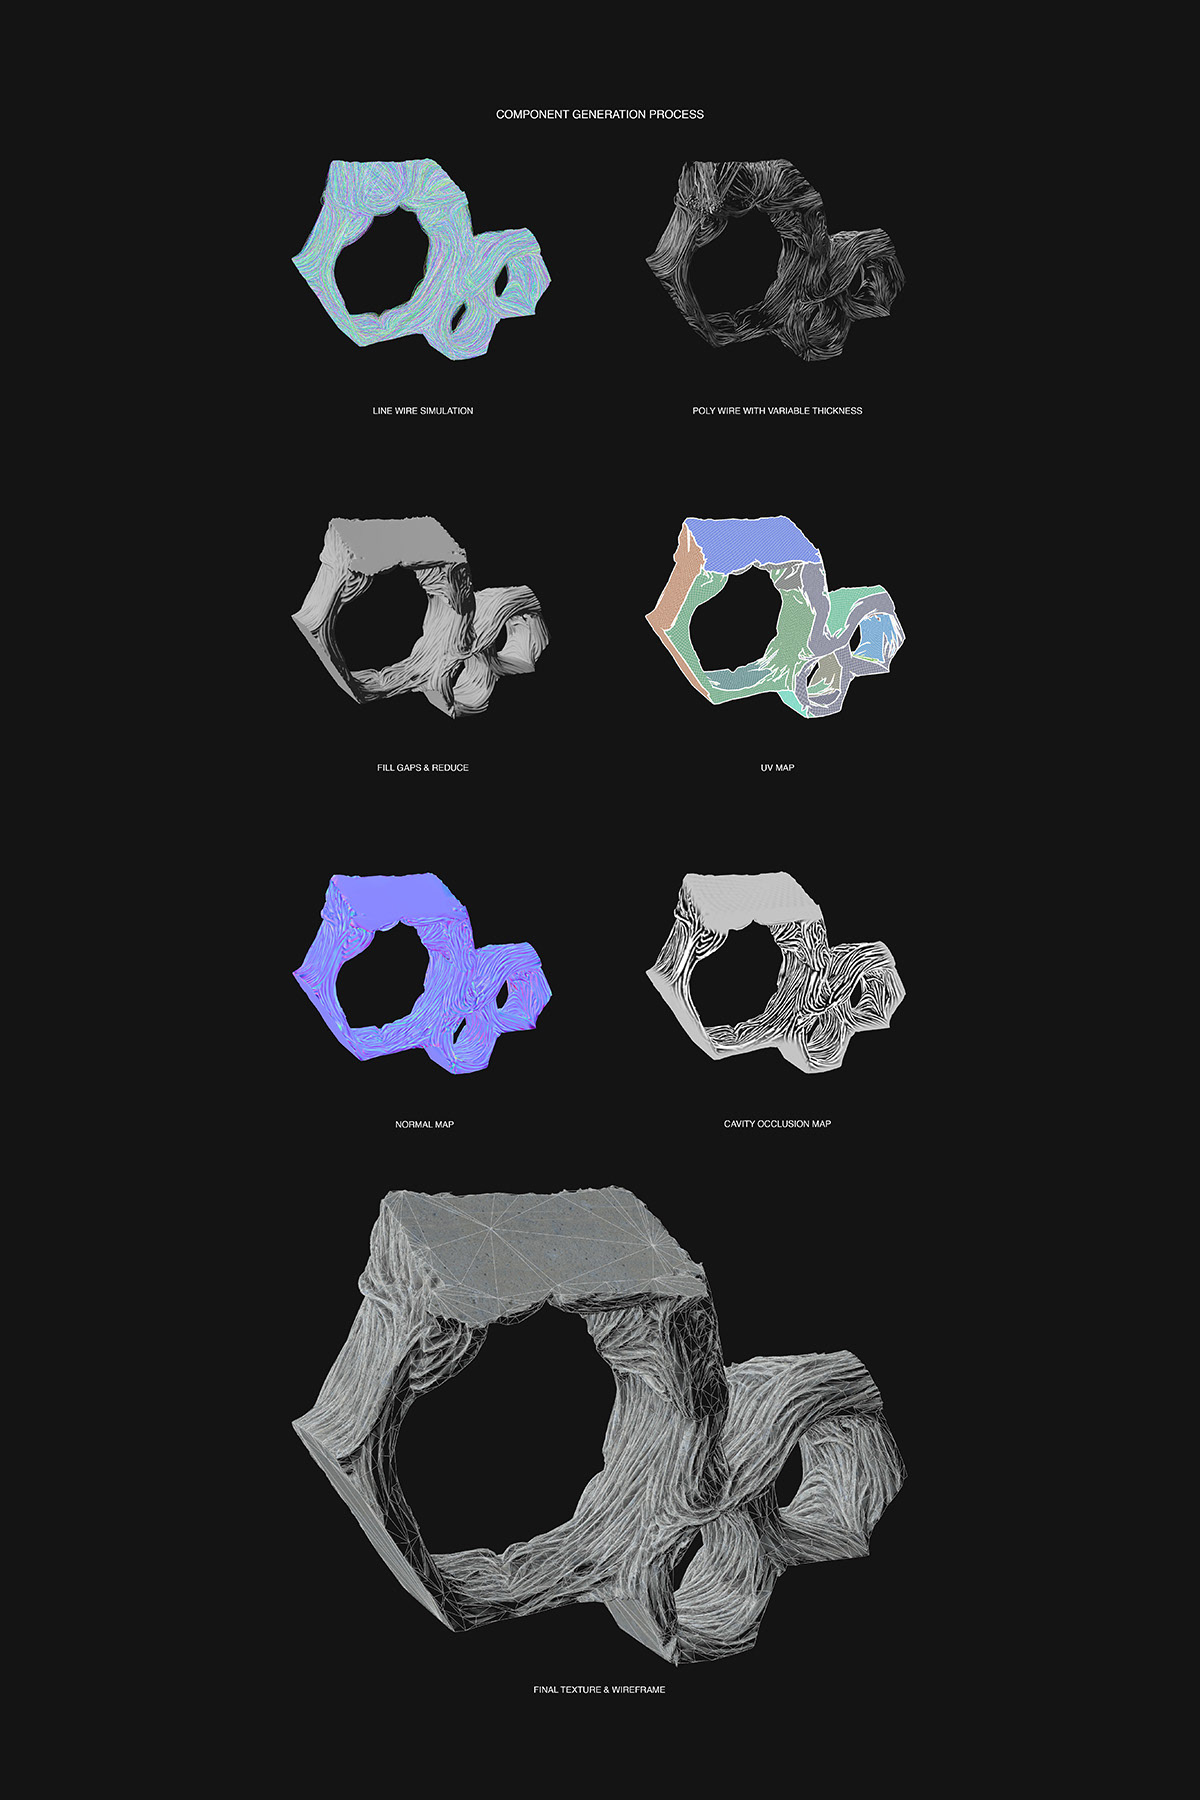 architecture art design hexagon pavilion ryan cook Shelf turbulentarch Unreal Engine Virtual reality